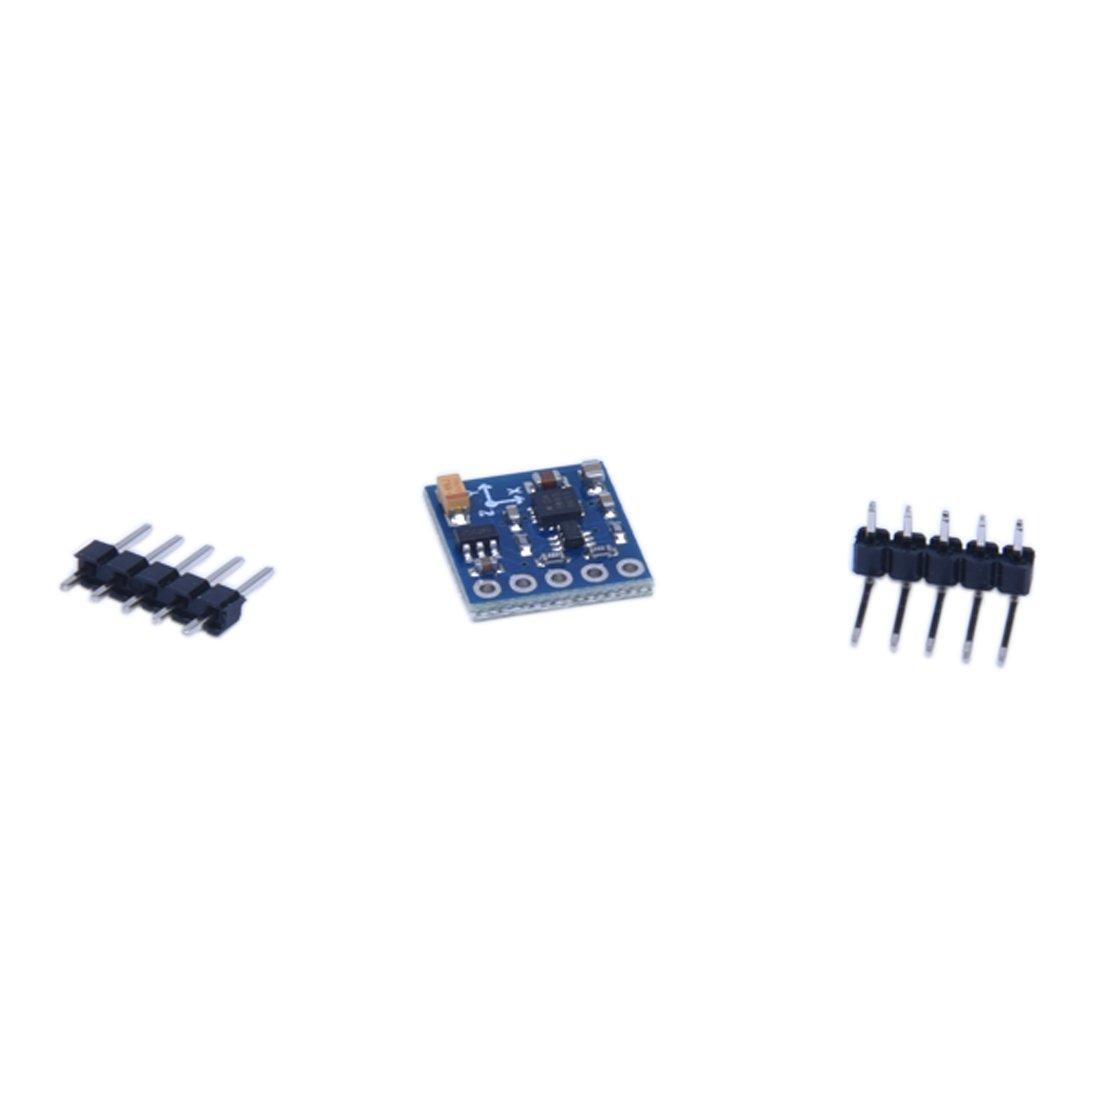 TOOGOO(R) HMC5883L Power supply:3V-5V Triple Axis Compass Magnetometer Sensor Module by TOOGOO(R) (Image #2)